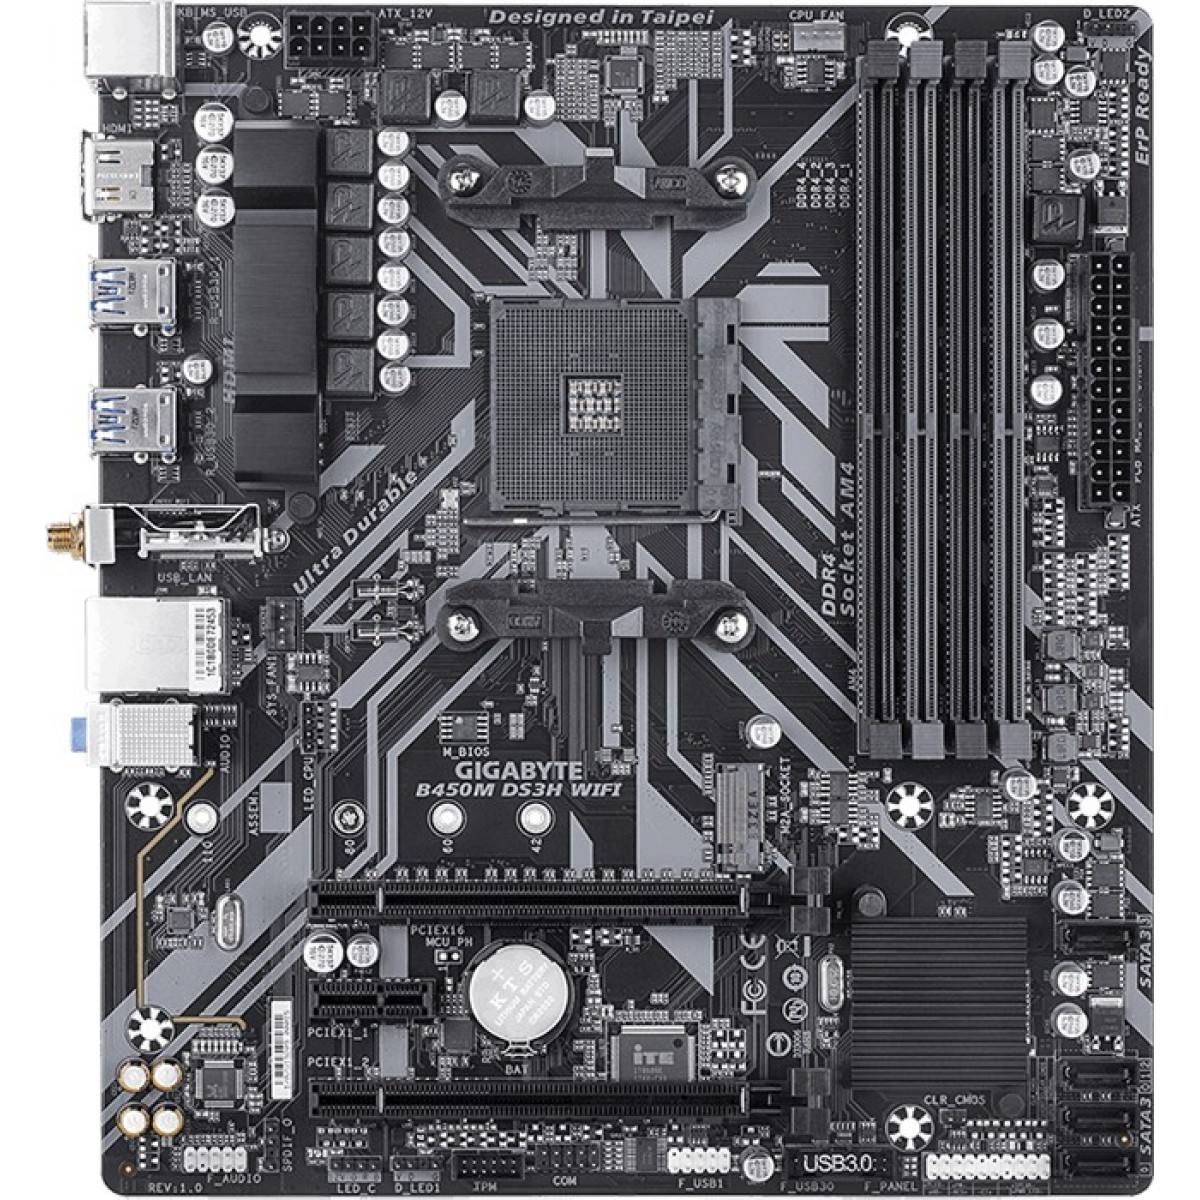 Placa Mãe Gigabyte B450M DS3H WIFI, Chipset B450, AMD AM4, mATX, DDR4